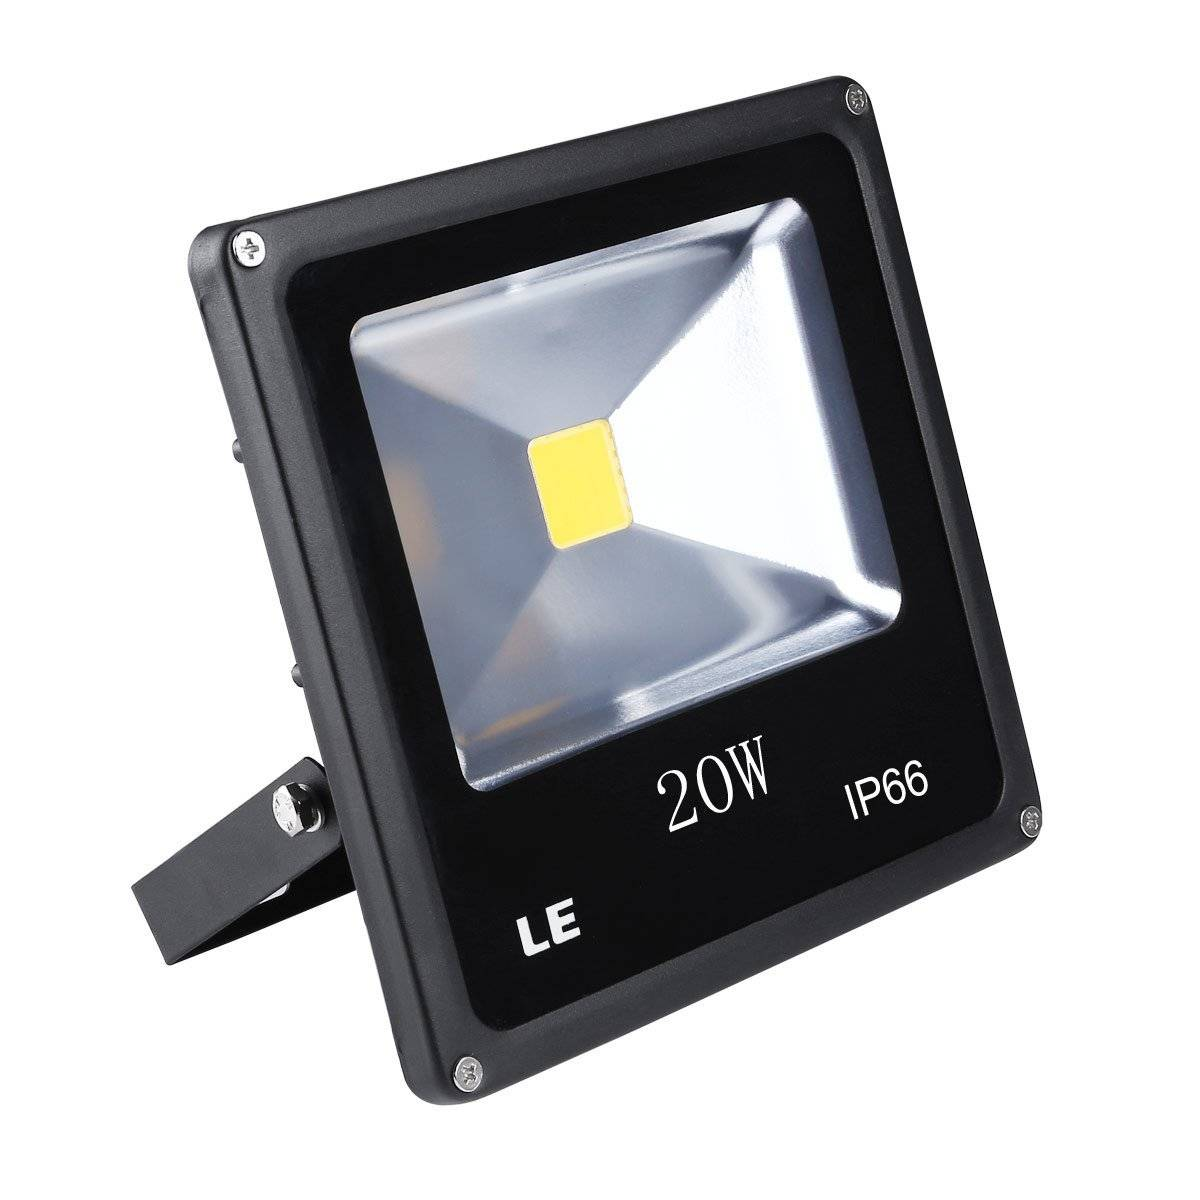 20W Super Bright Outdoor LED Flood Lights, 200W Halogen Bulb Equivalent